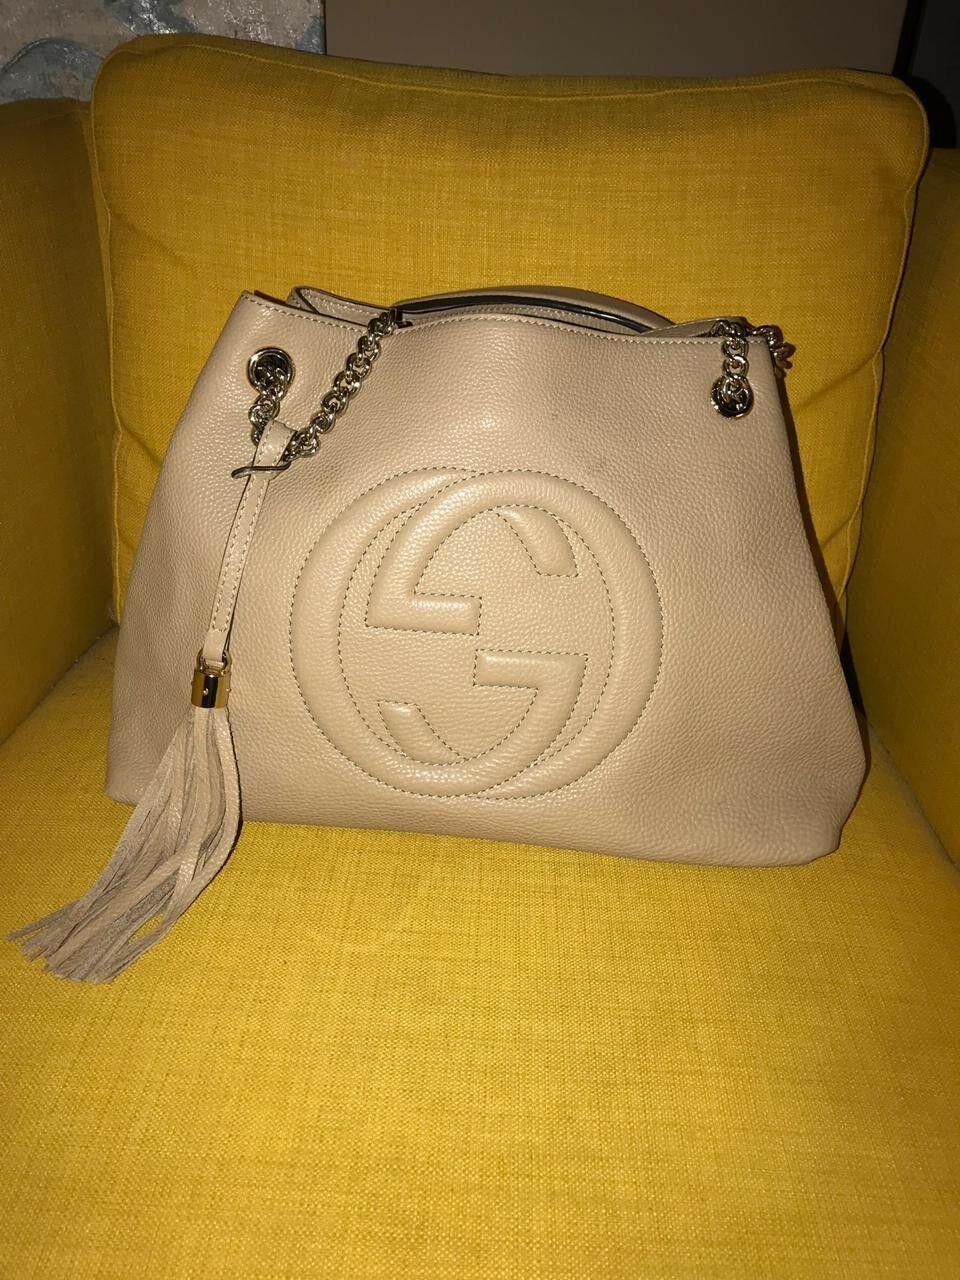 e0588a6be86 Gucci Soho Tassel Beige Leather Chain Shoulder Bag